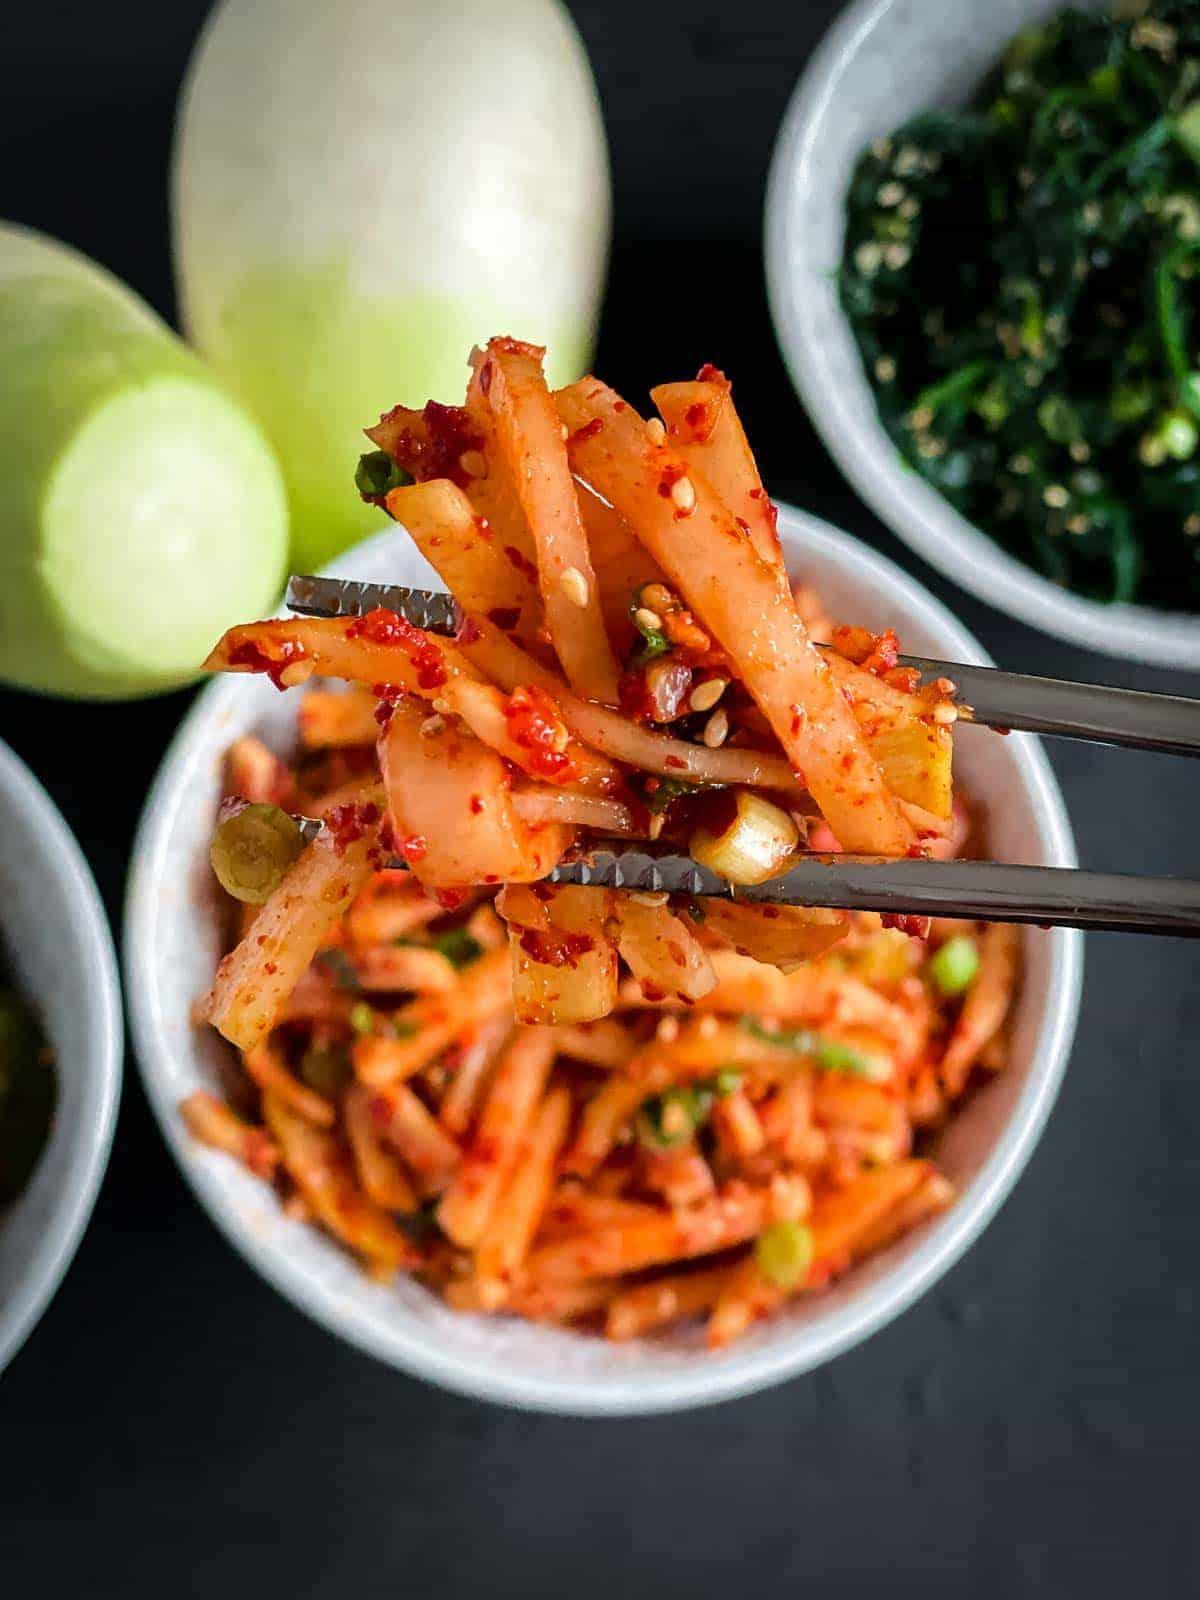 Korean Radish Salad - Musaengchae